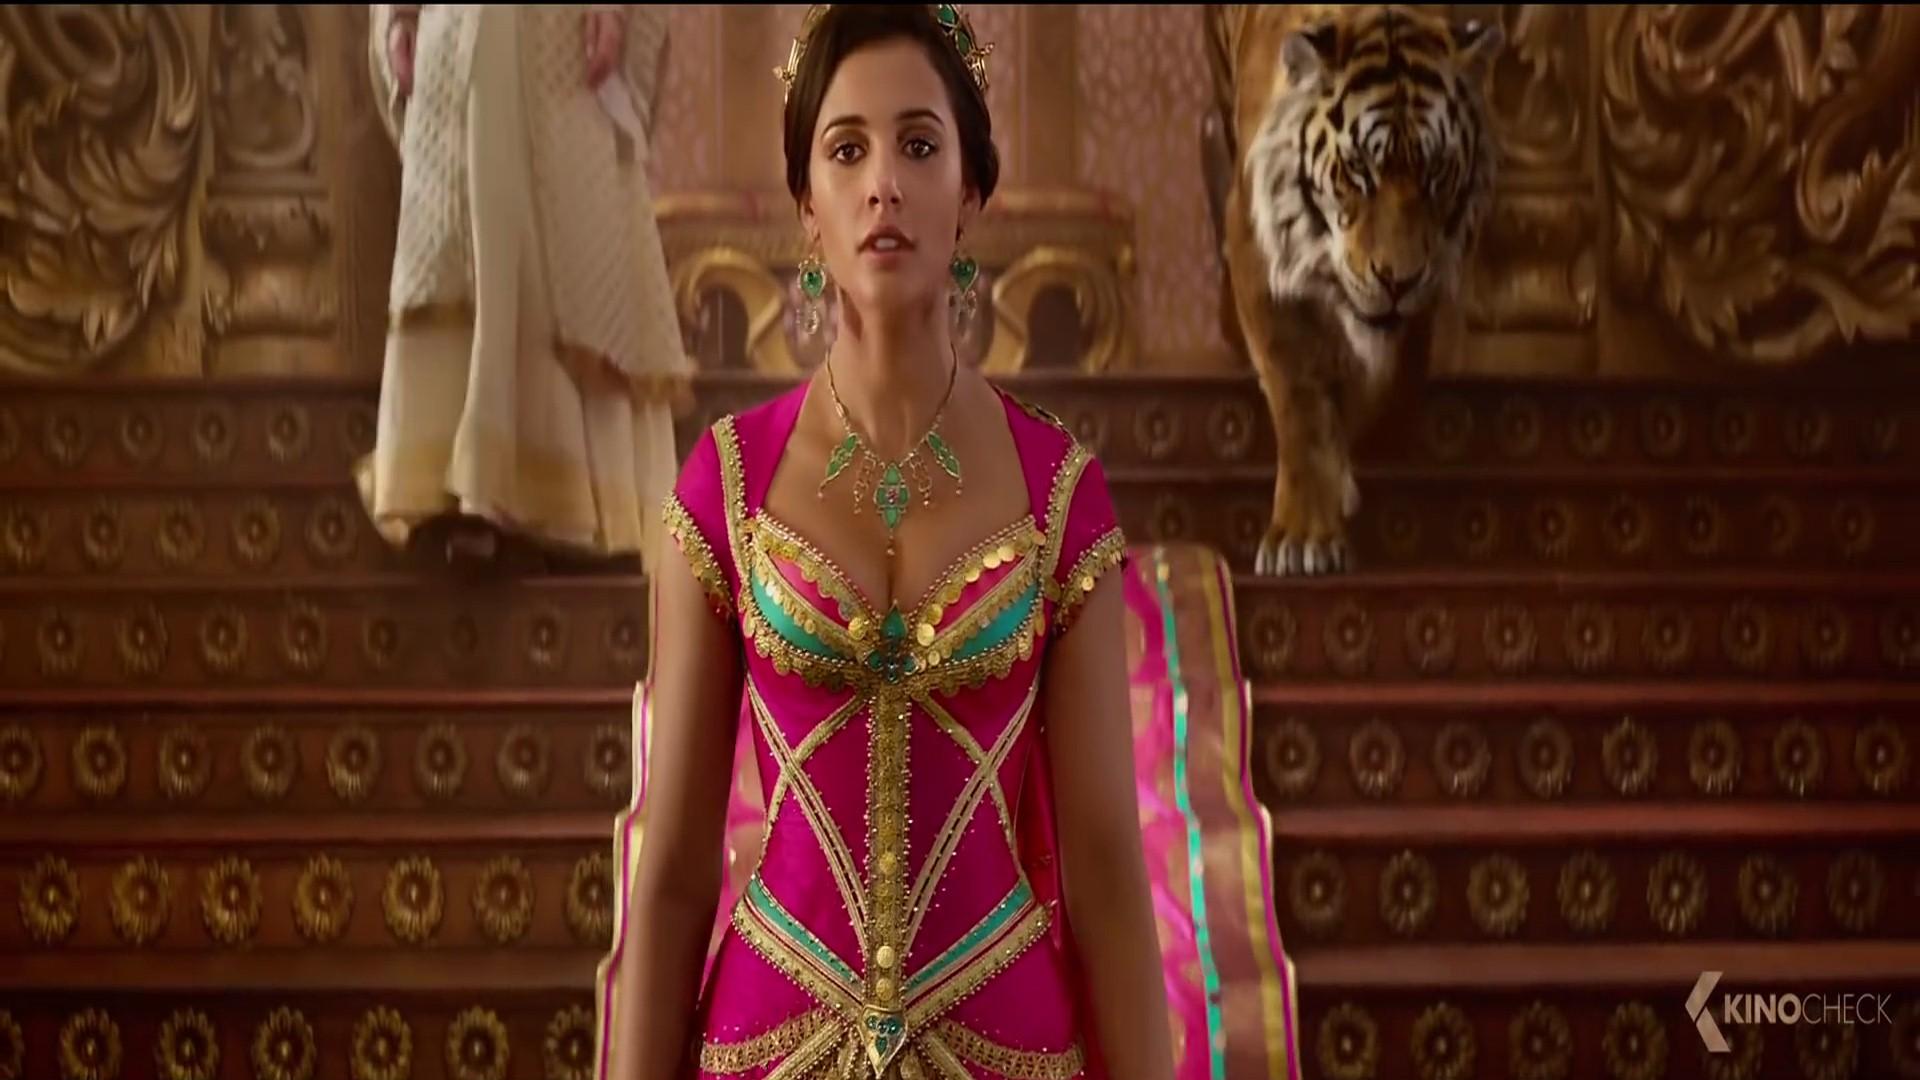 Aladdin 2019 Disney Live Action Remake Princess Movies